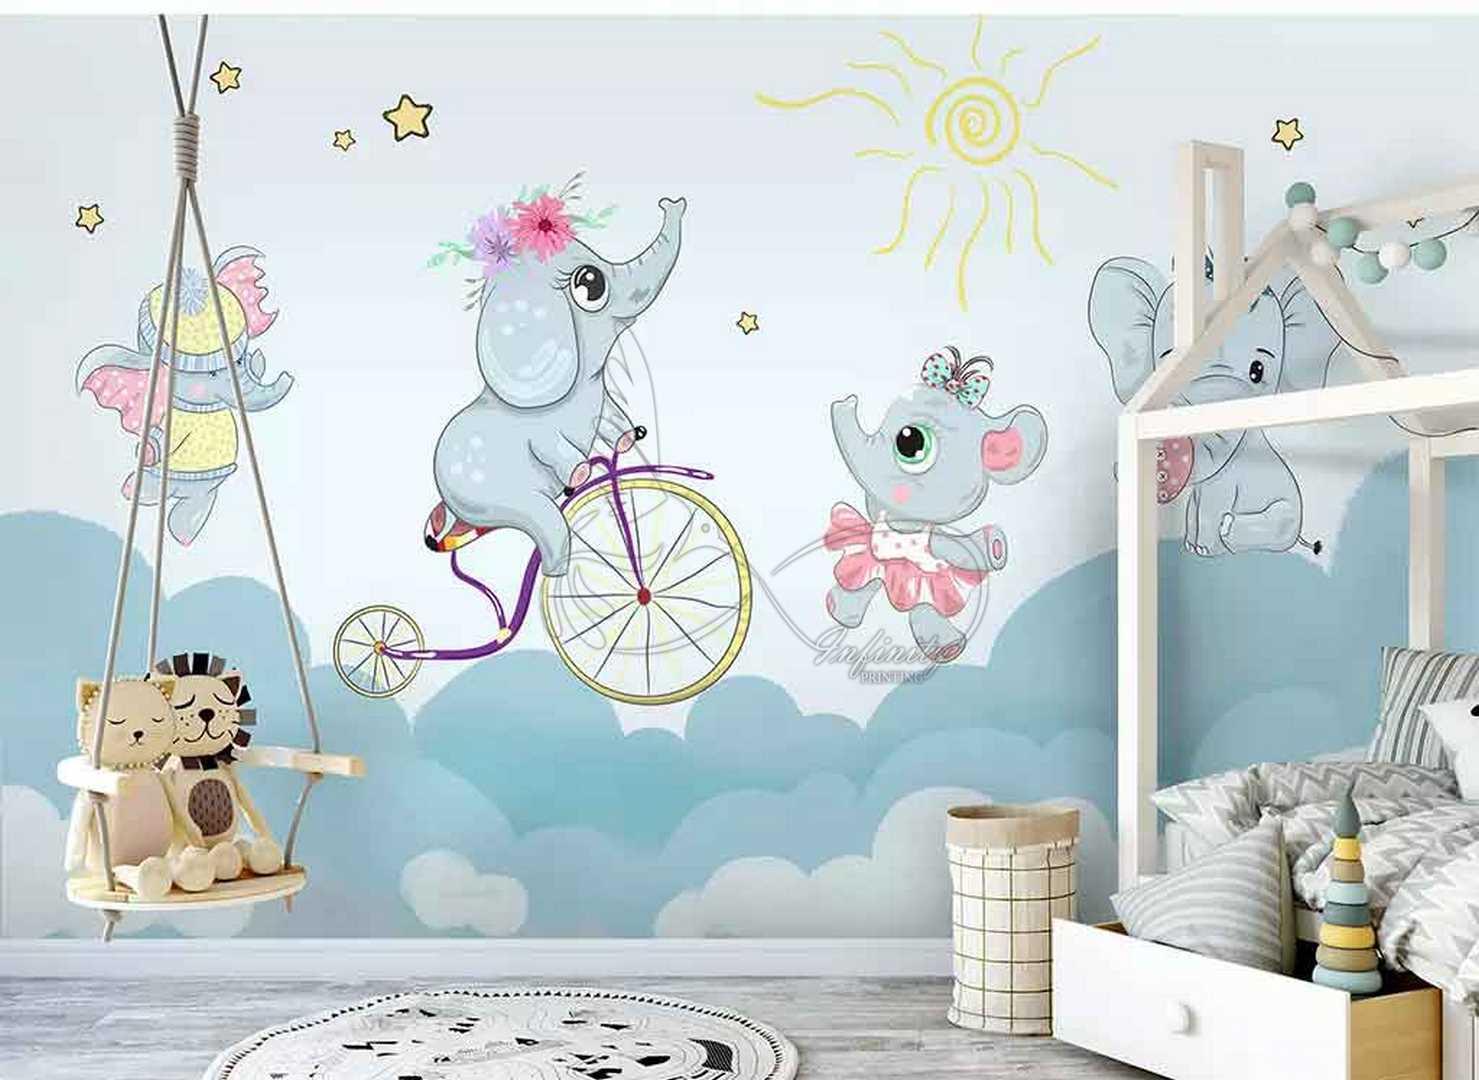 Fantasy child room design wall poster printing code 3126